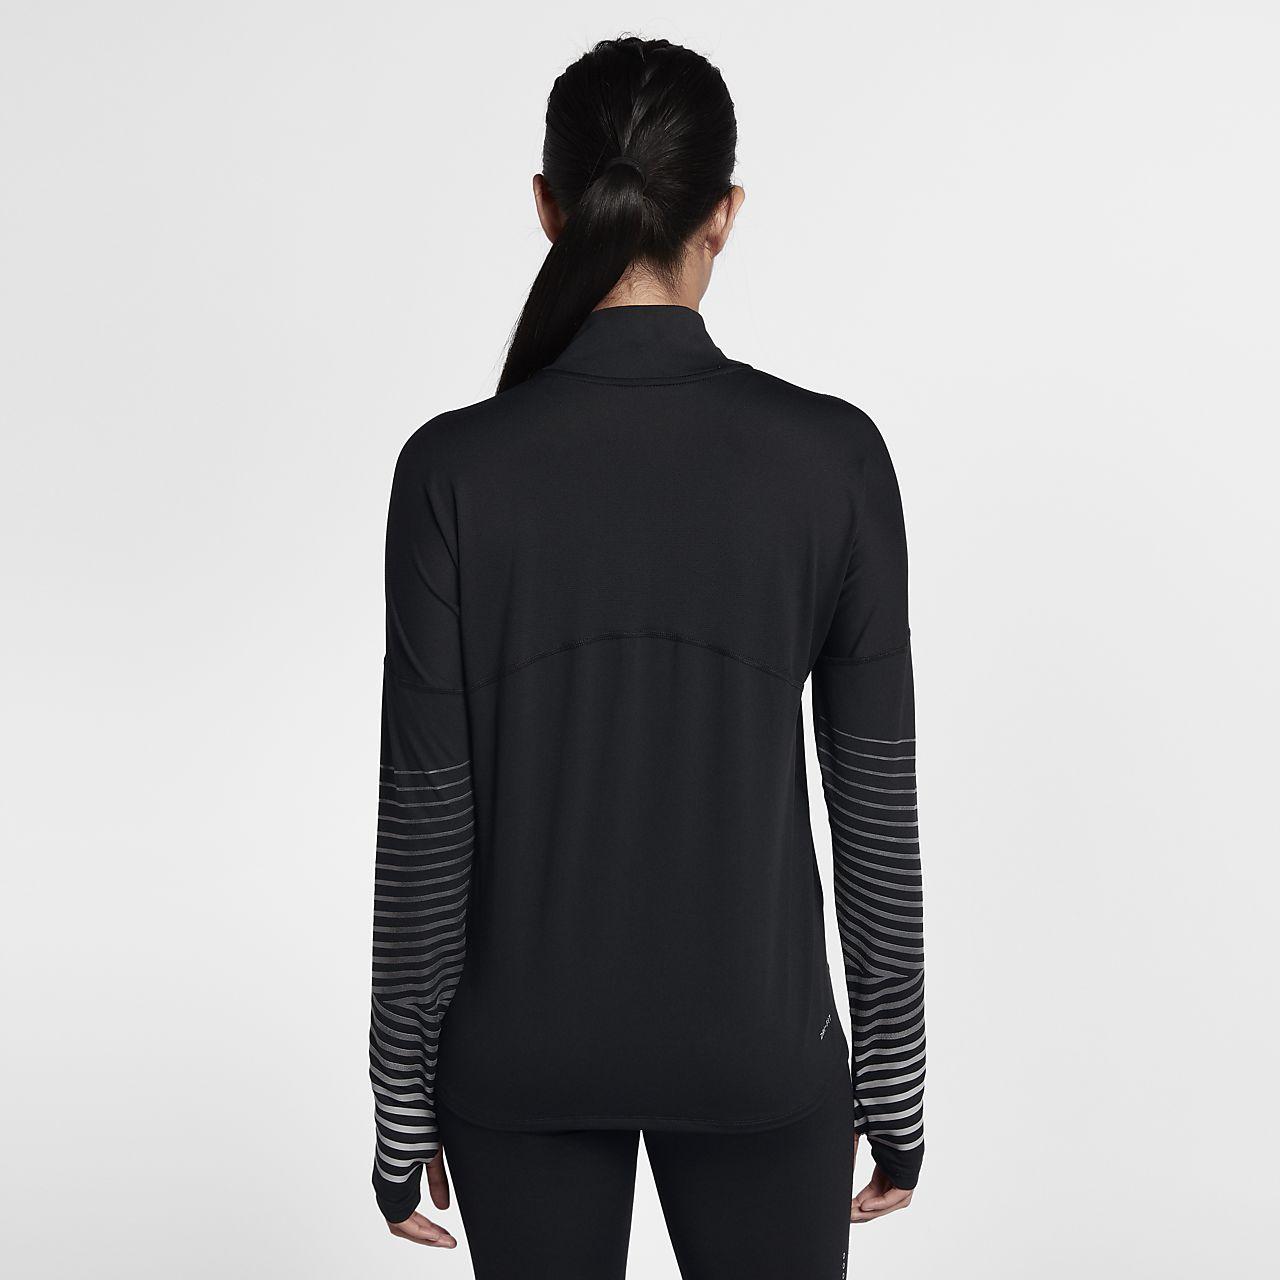 Nike Dri FIT Element Flash Women's Reflective Long Sleeve Running Top